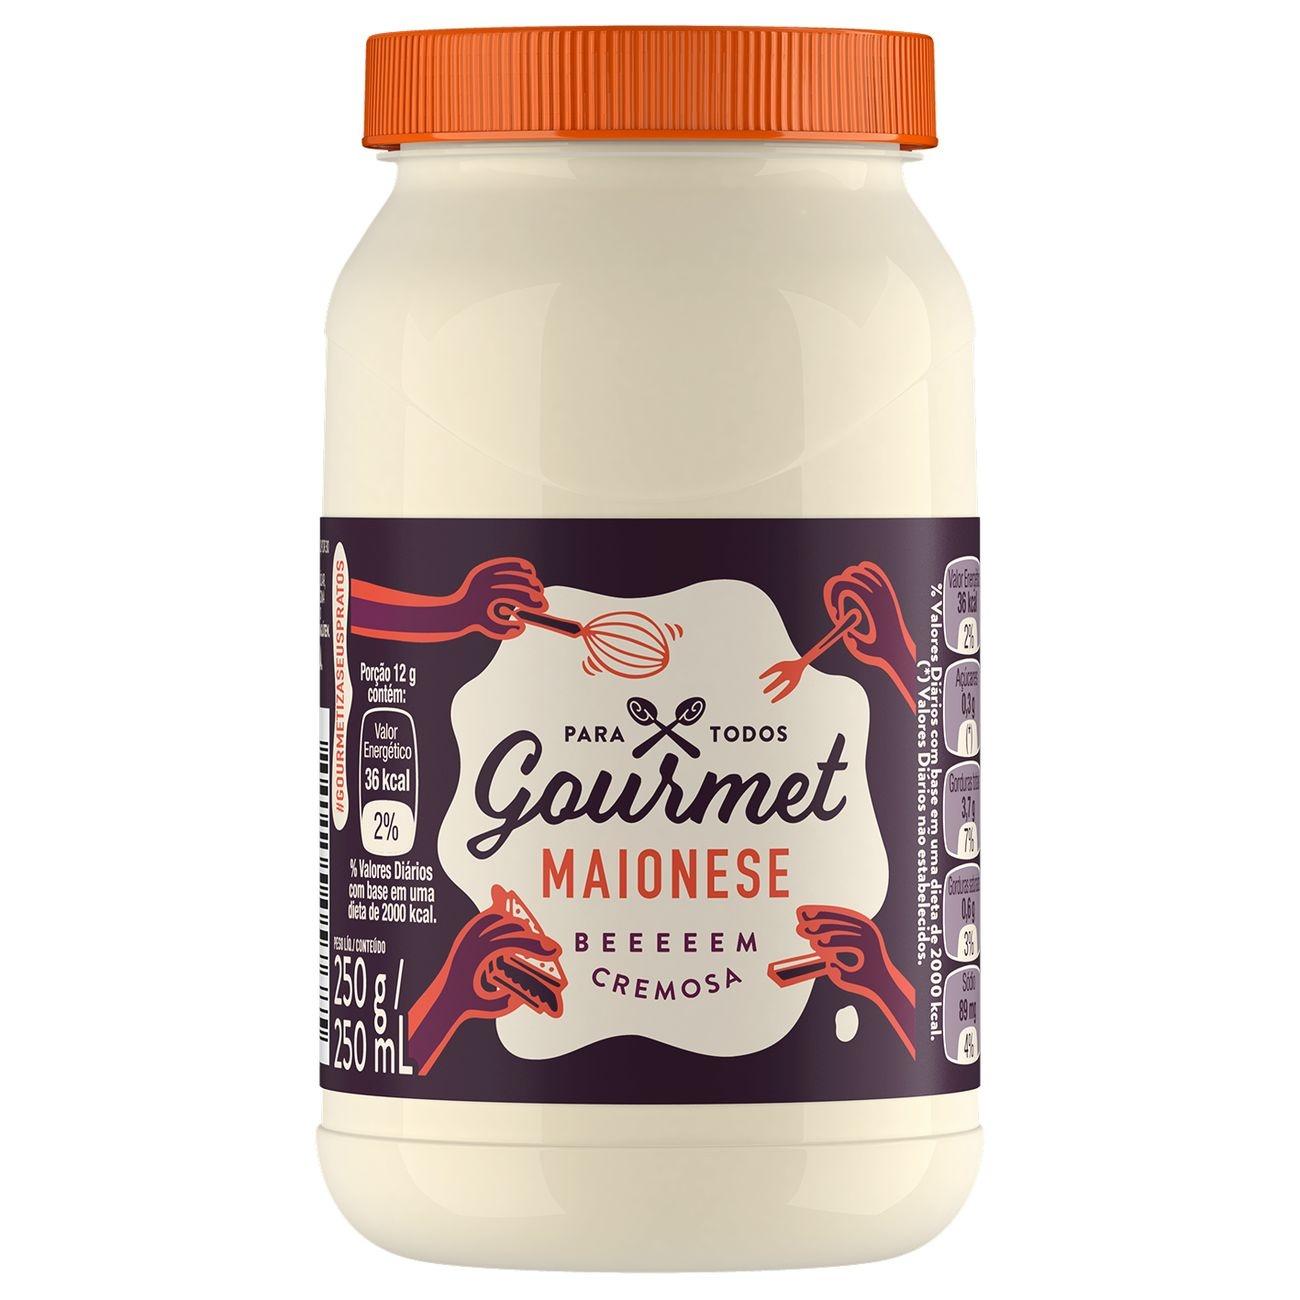 Maionese Gourmet Regular 250g